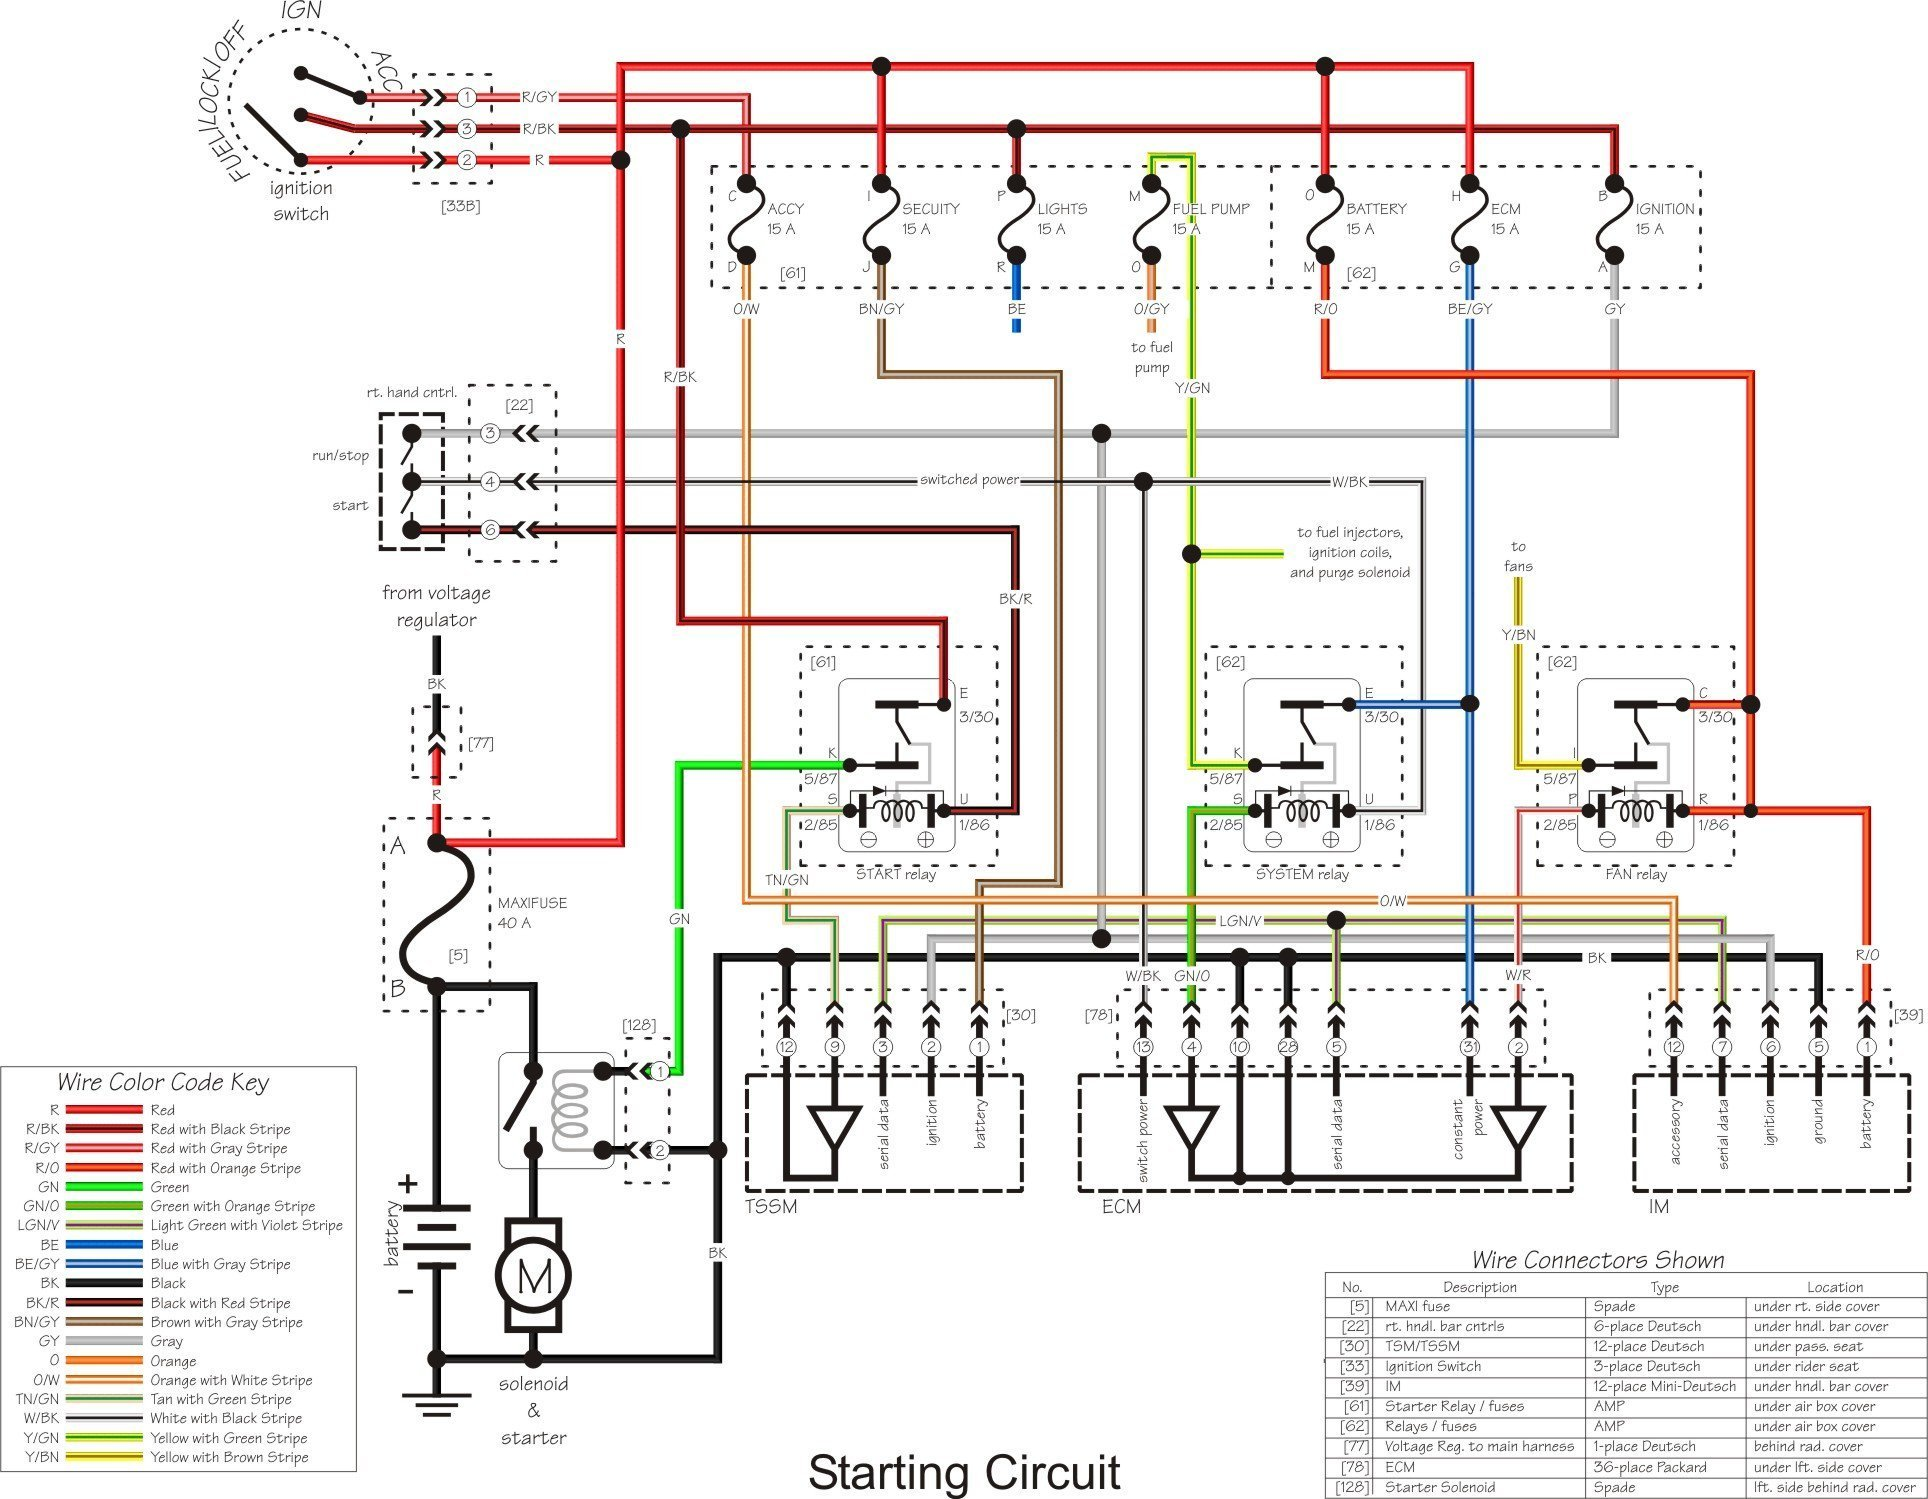 1991 harley davidson sportster 883 wiring diagram schematics and harley davidson wiring diagram manual 1995 as well mercedes